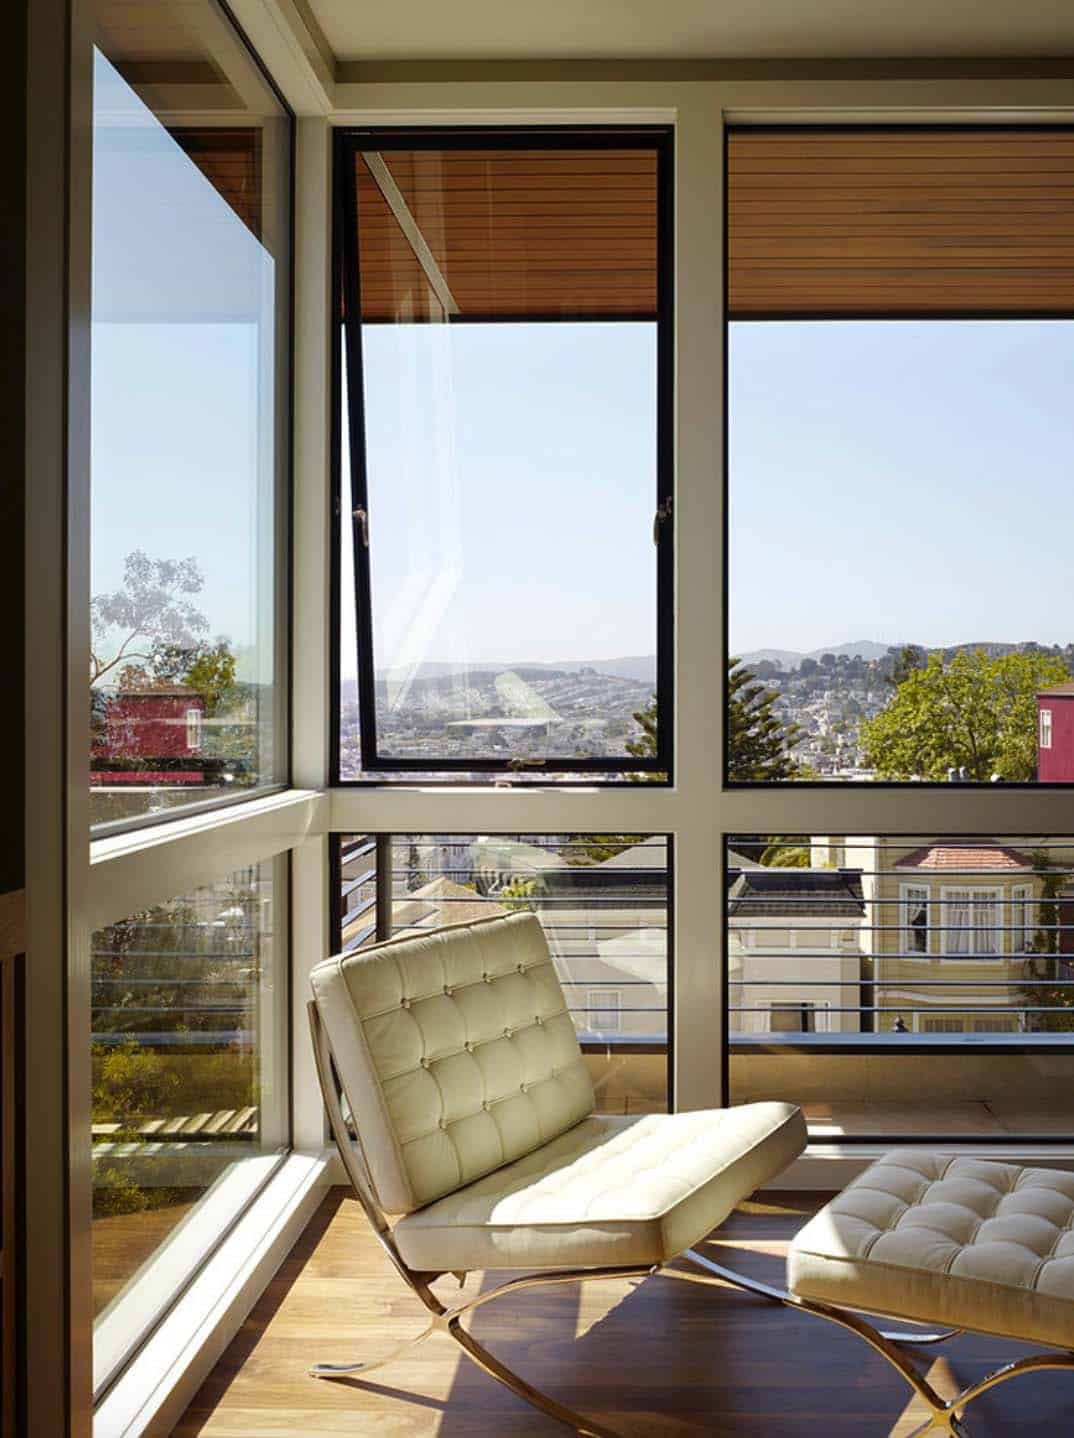 Architecture Modern Hillside Home-19-1 Kindesign